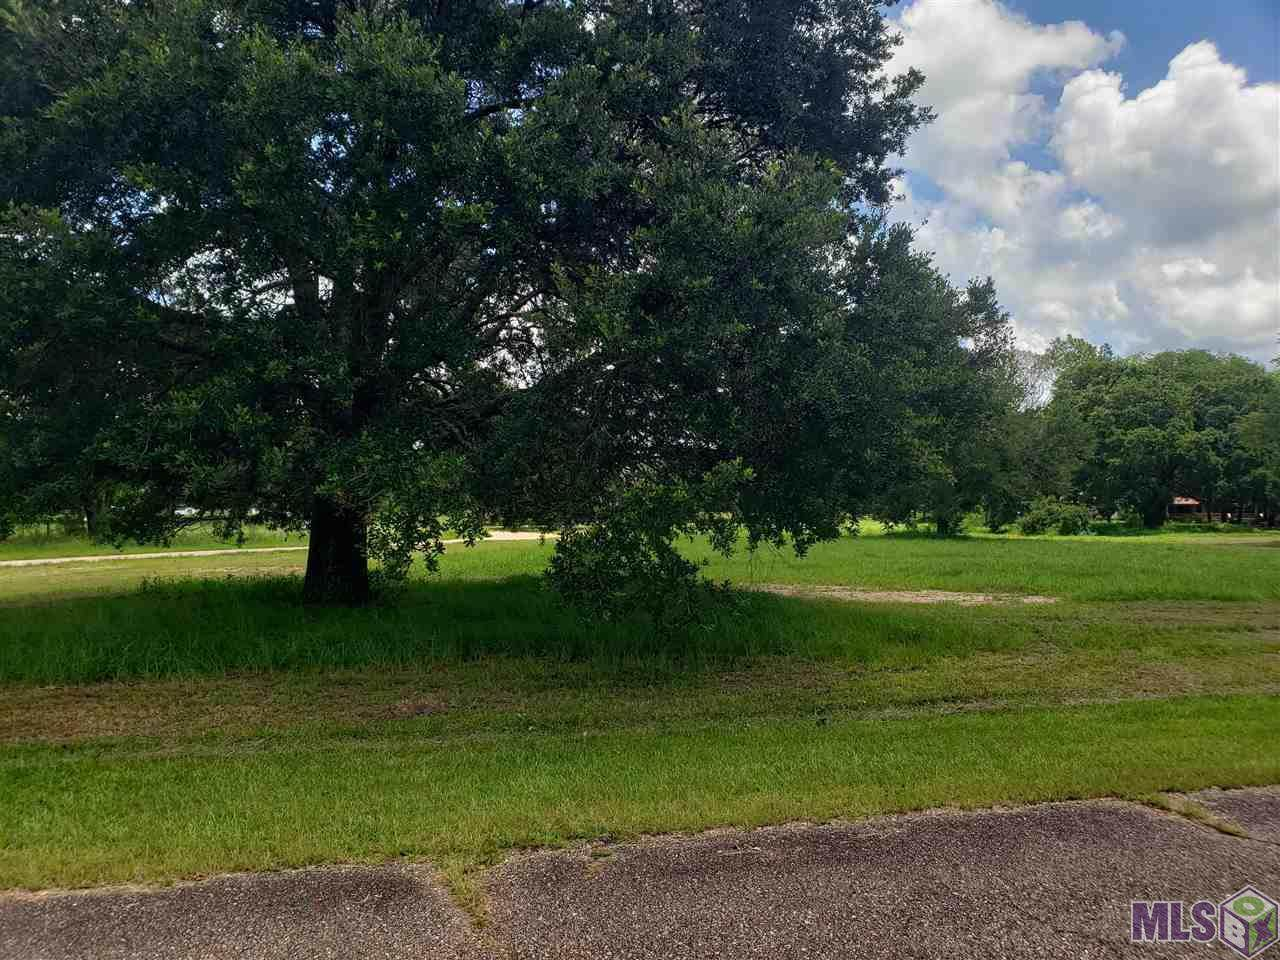 Lot 15 Tranquility Oaks - Photo 1